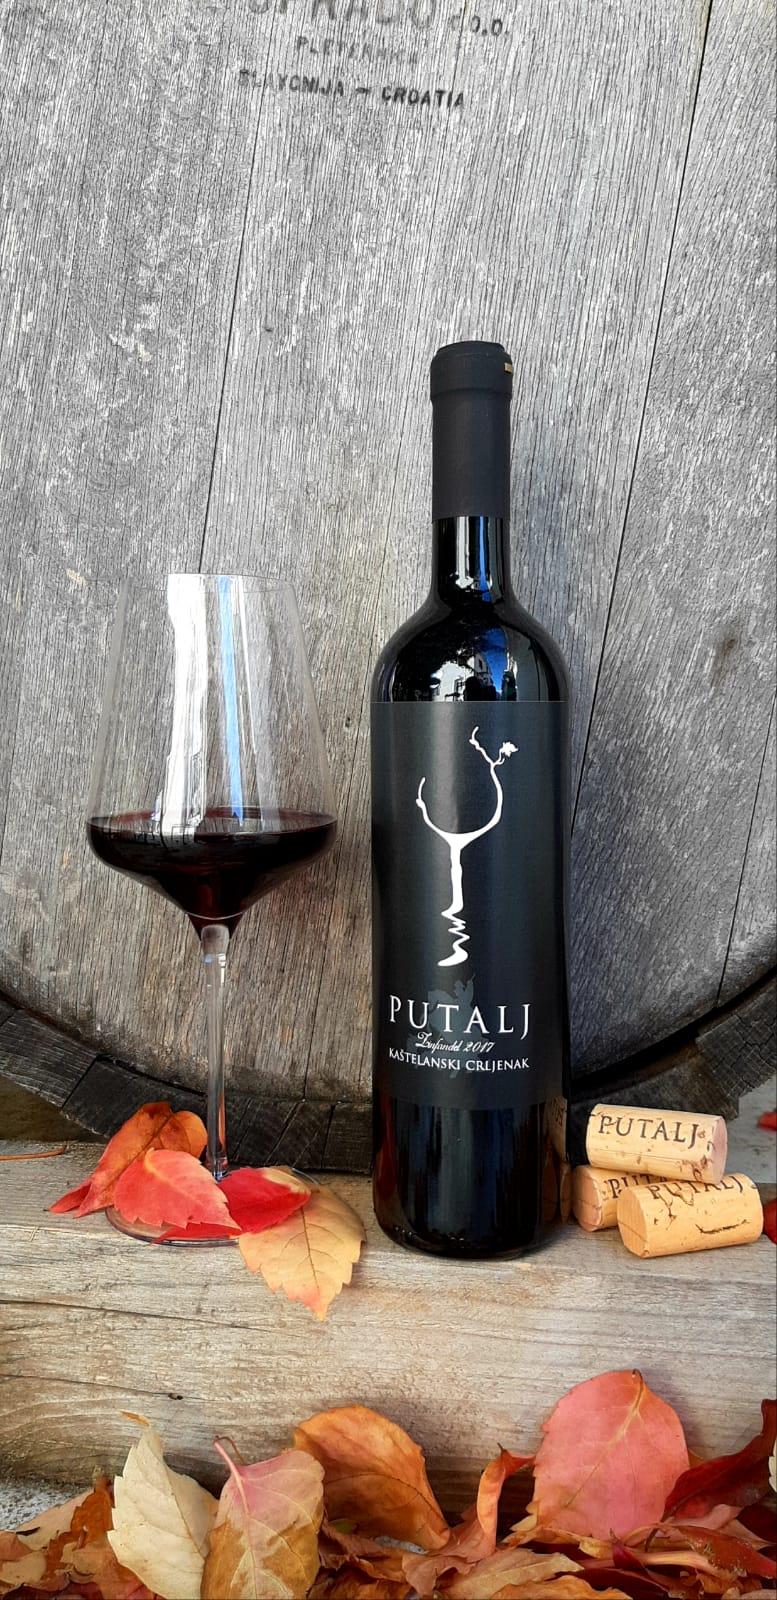 Putalj Zinfandel wine